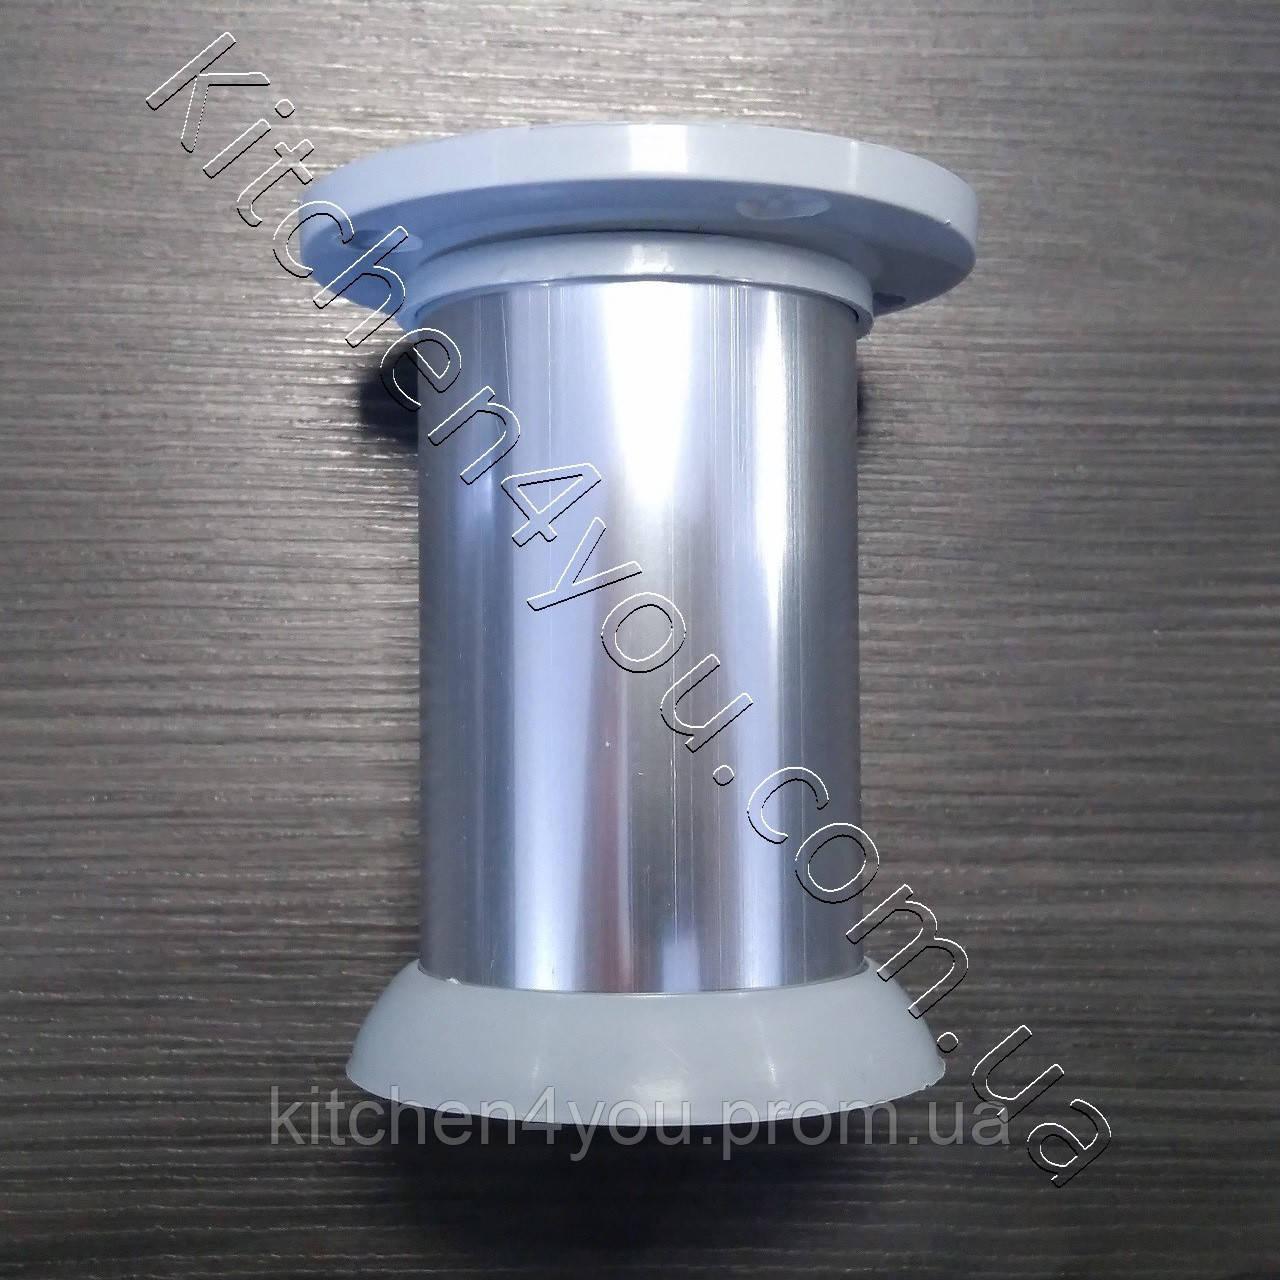 Ножка мебельная круглая IS 42GL-80 мм. алюминий глнцевый